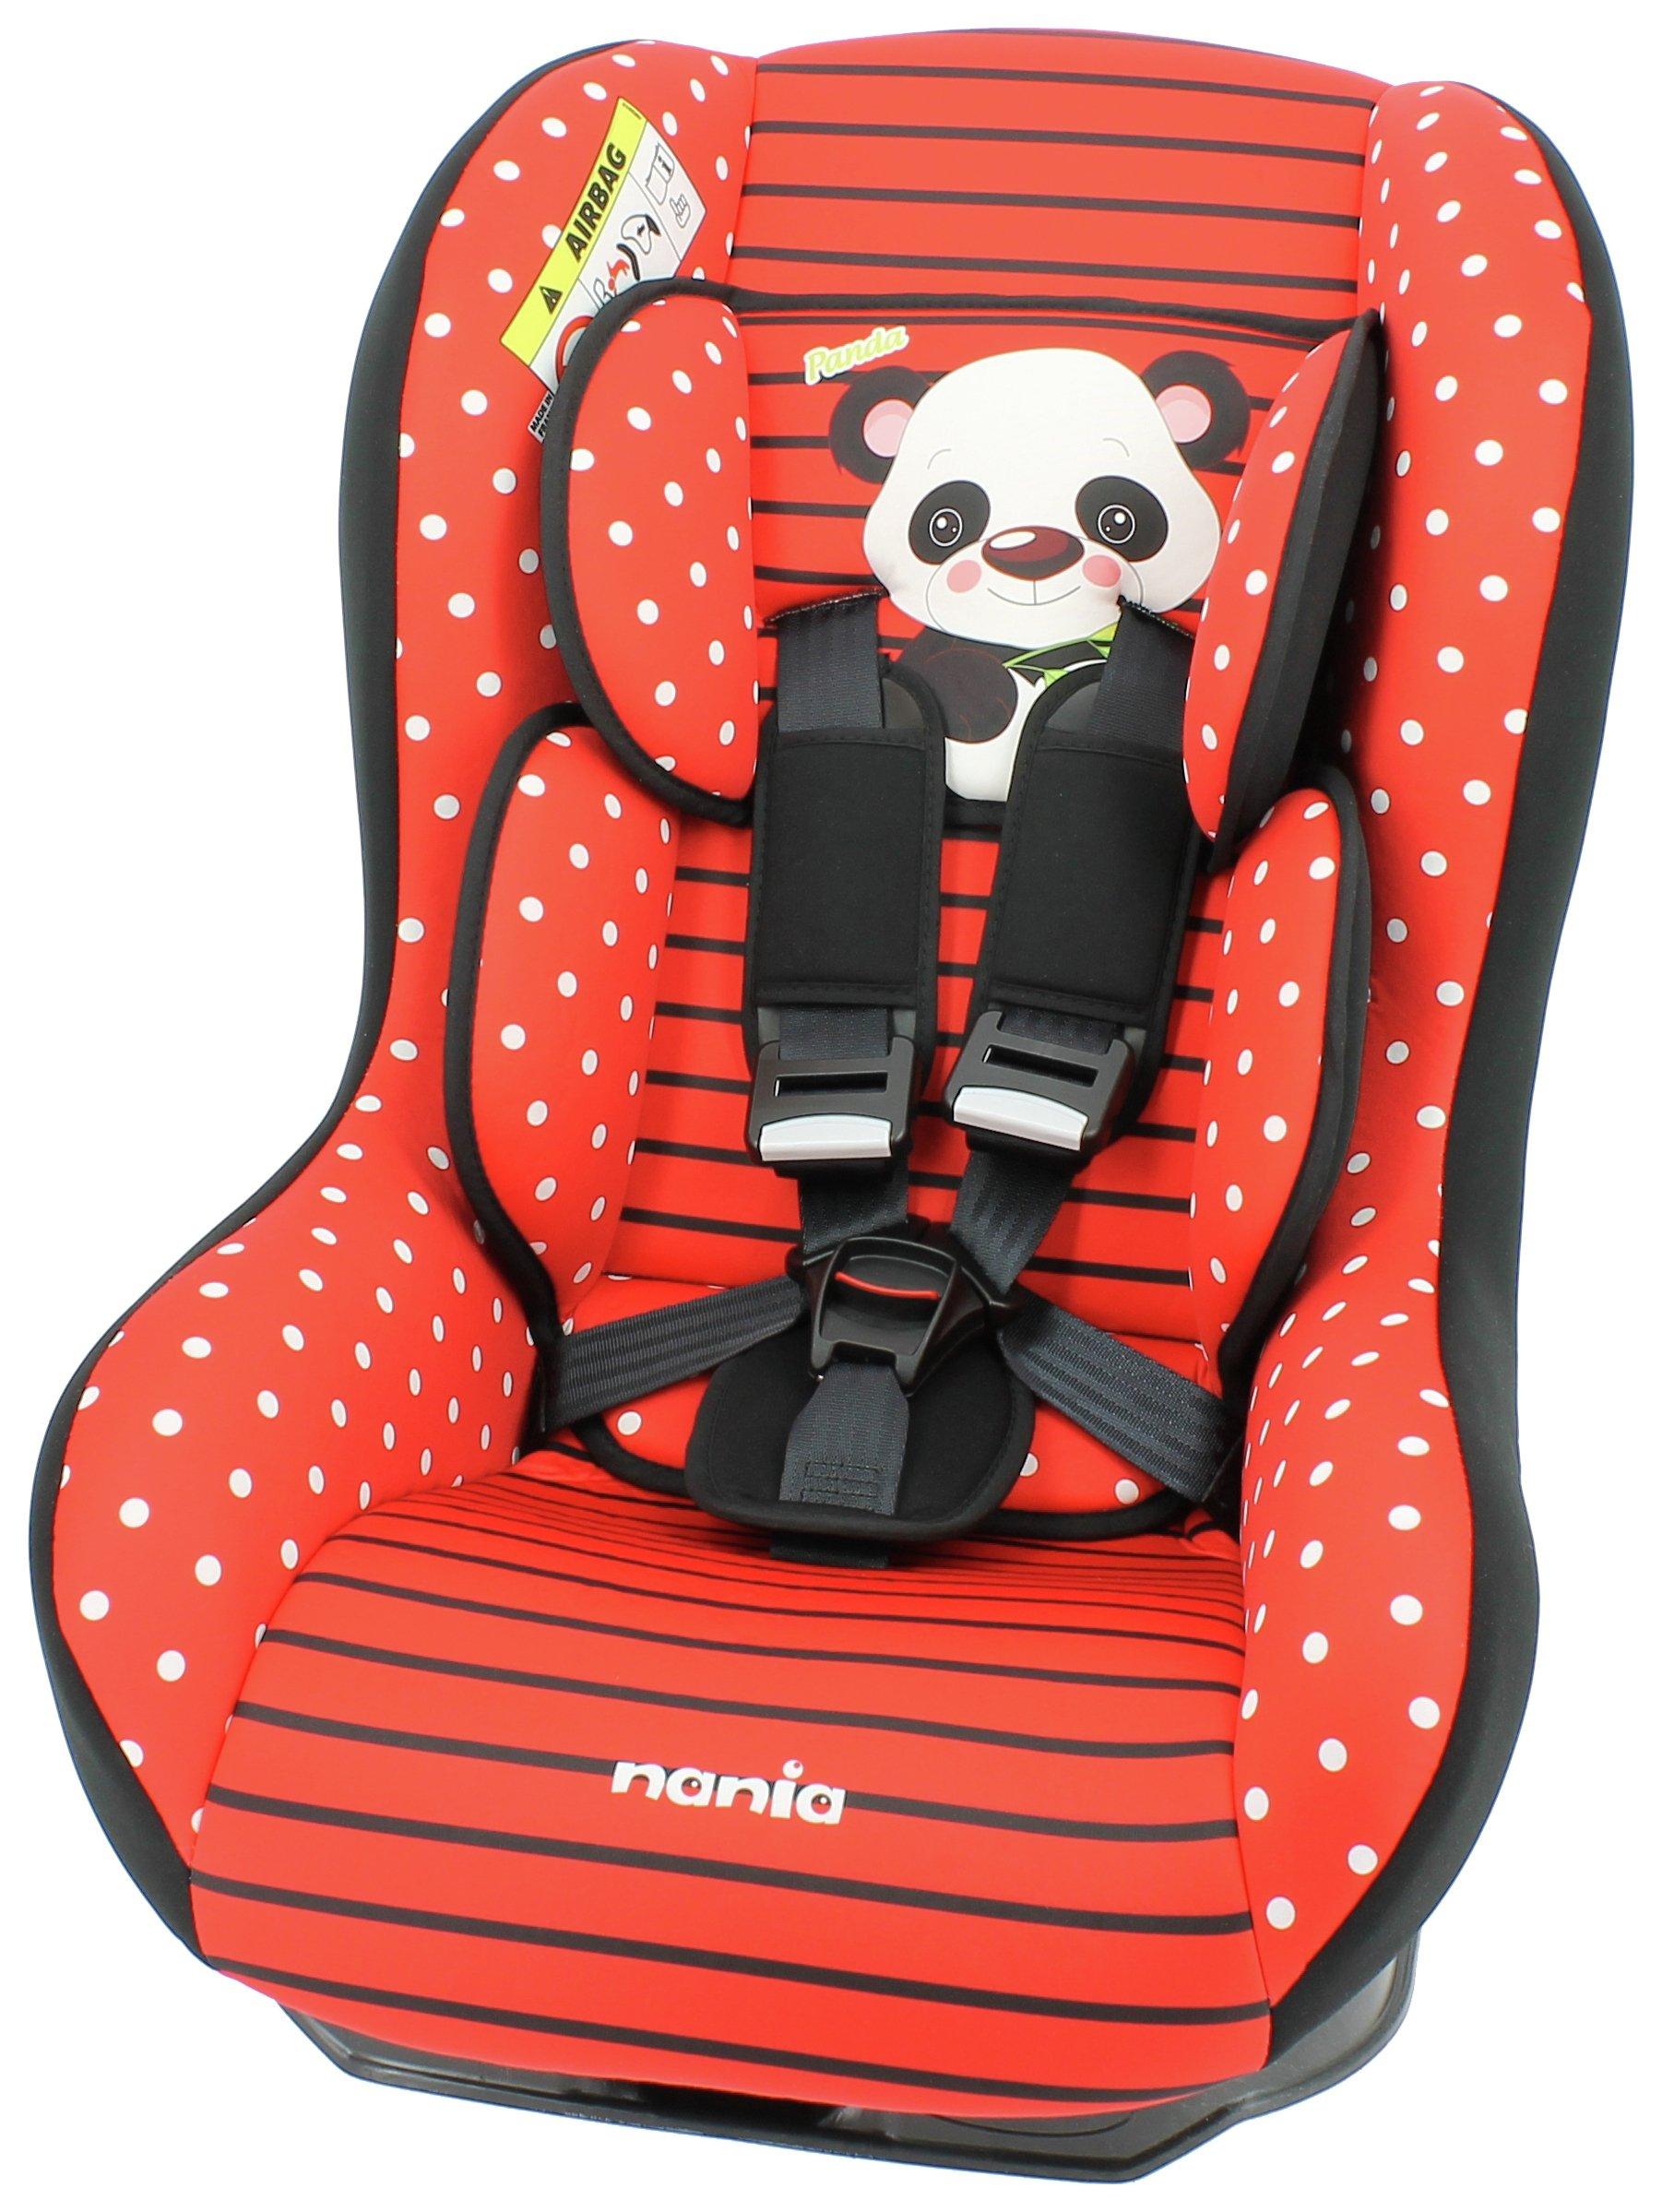 Driver Panda Group 0+/1 Car Seat - Red